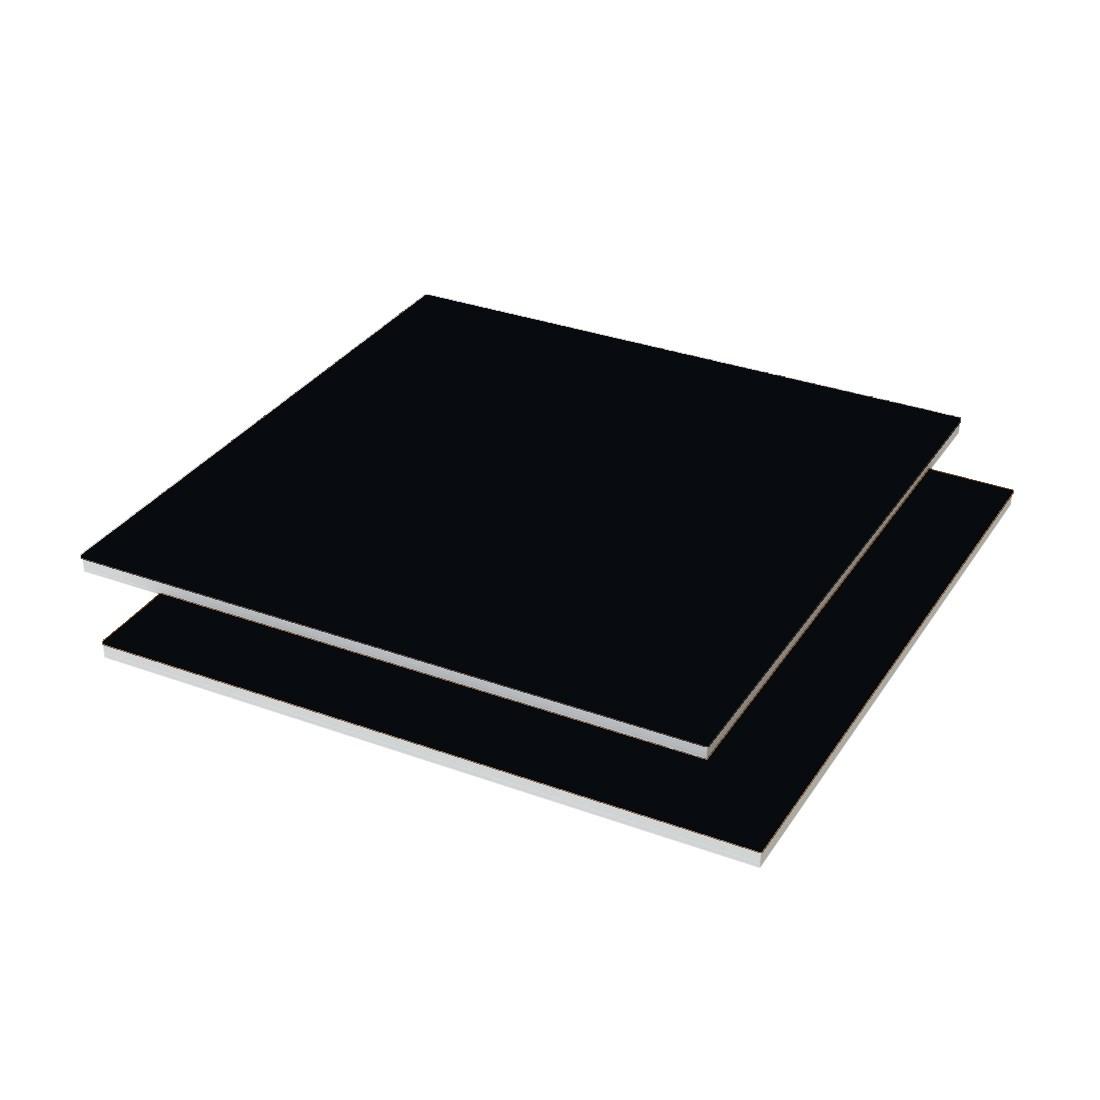 Katz Display board Karton Zwart 20st/doos 860x610x1,6mm